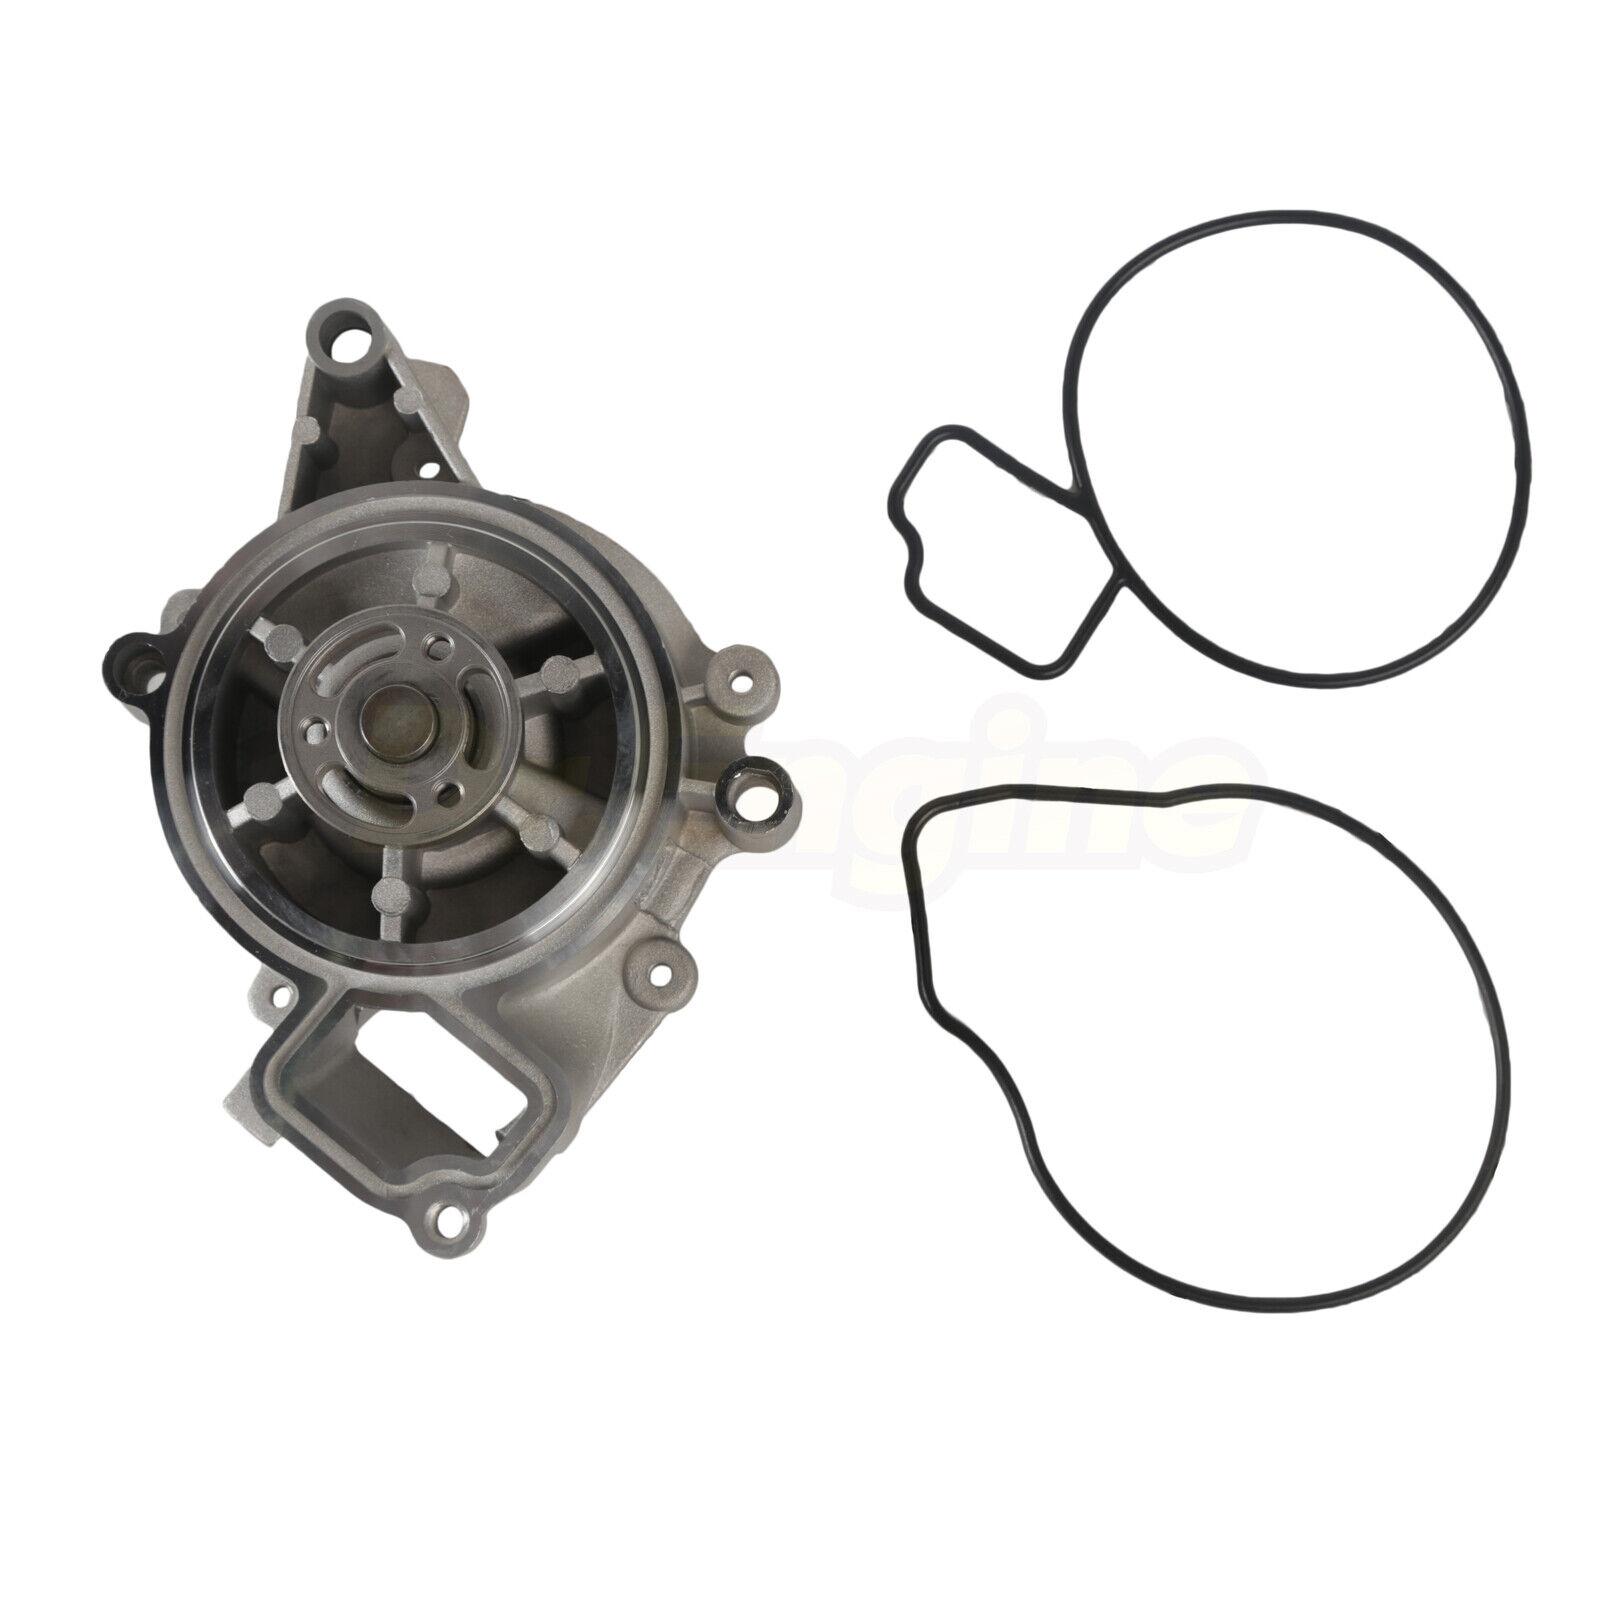 Timing Chain Kit  U0026 Head Gasket Set For 2007 2008 Chevrolet Cobalt 2 2l Dohc